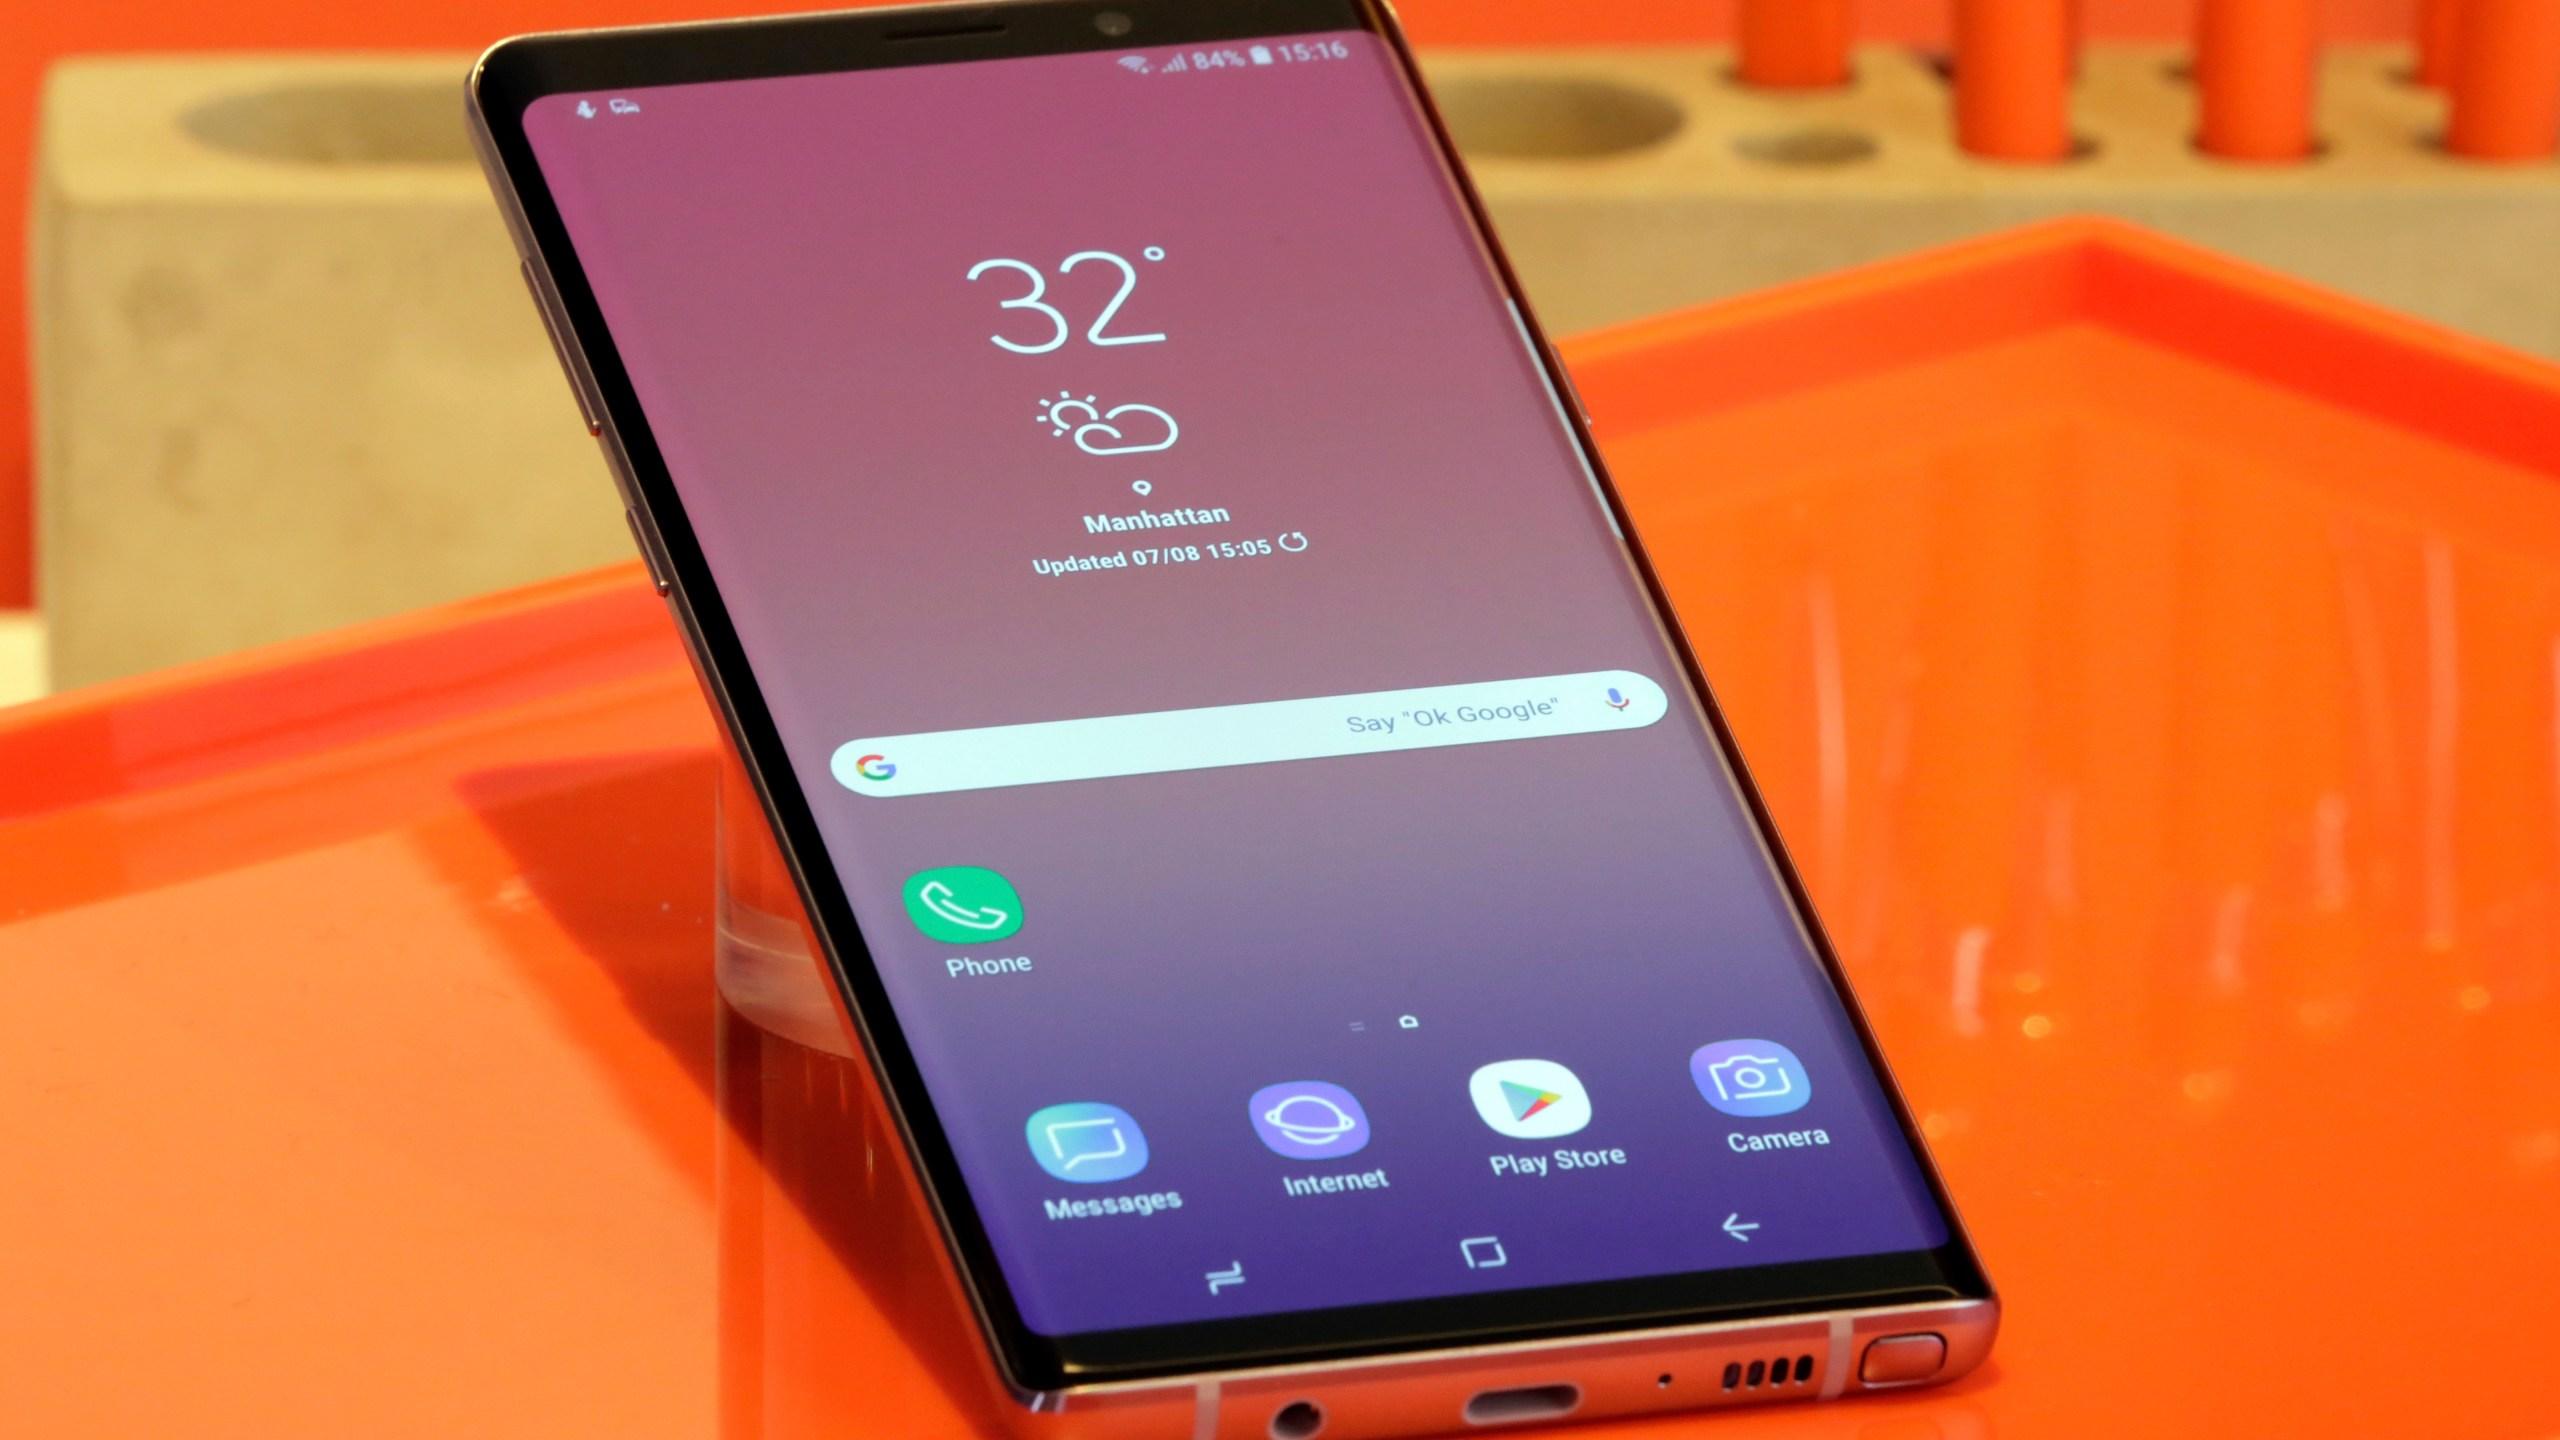 TEC_Samsung's_Next_Phone_84360-159532.jpg69308567